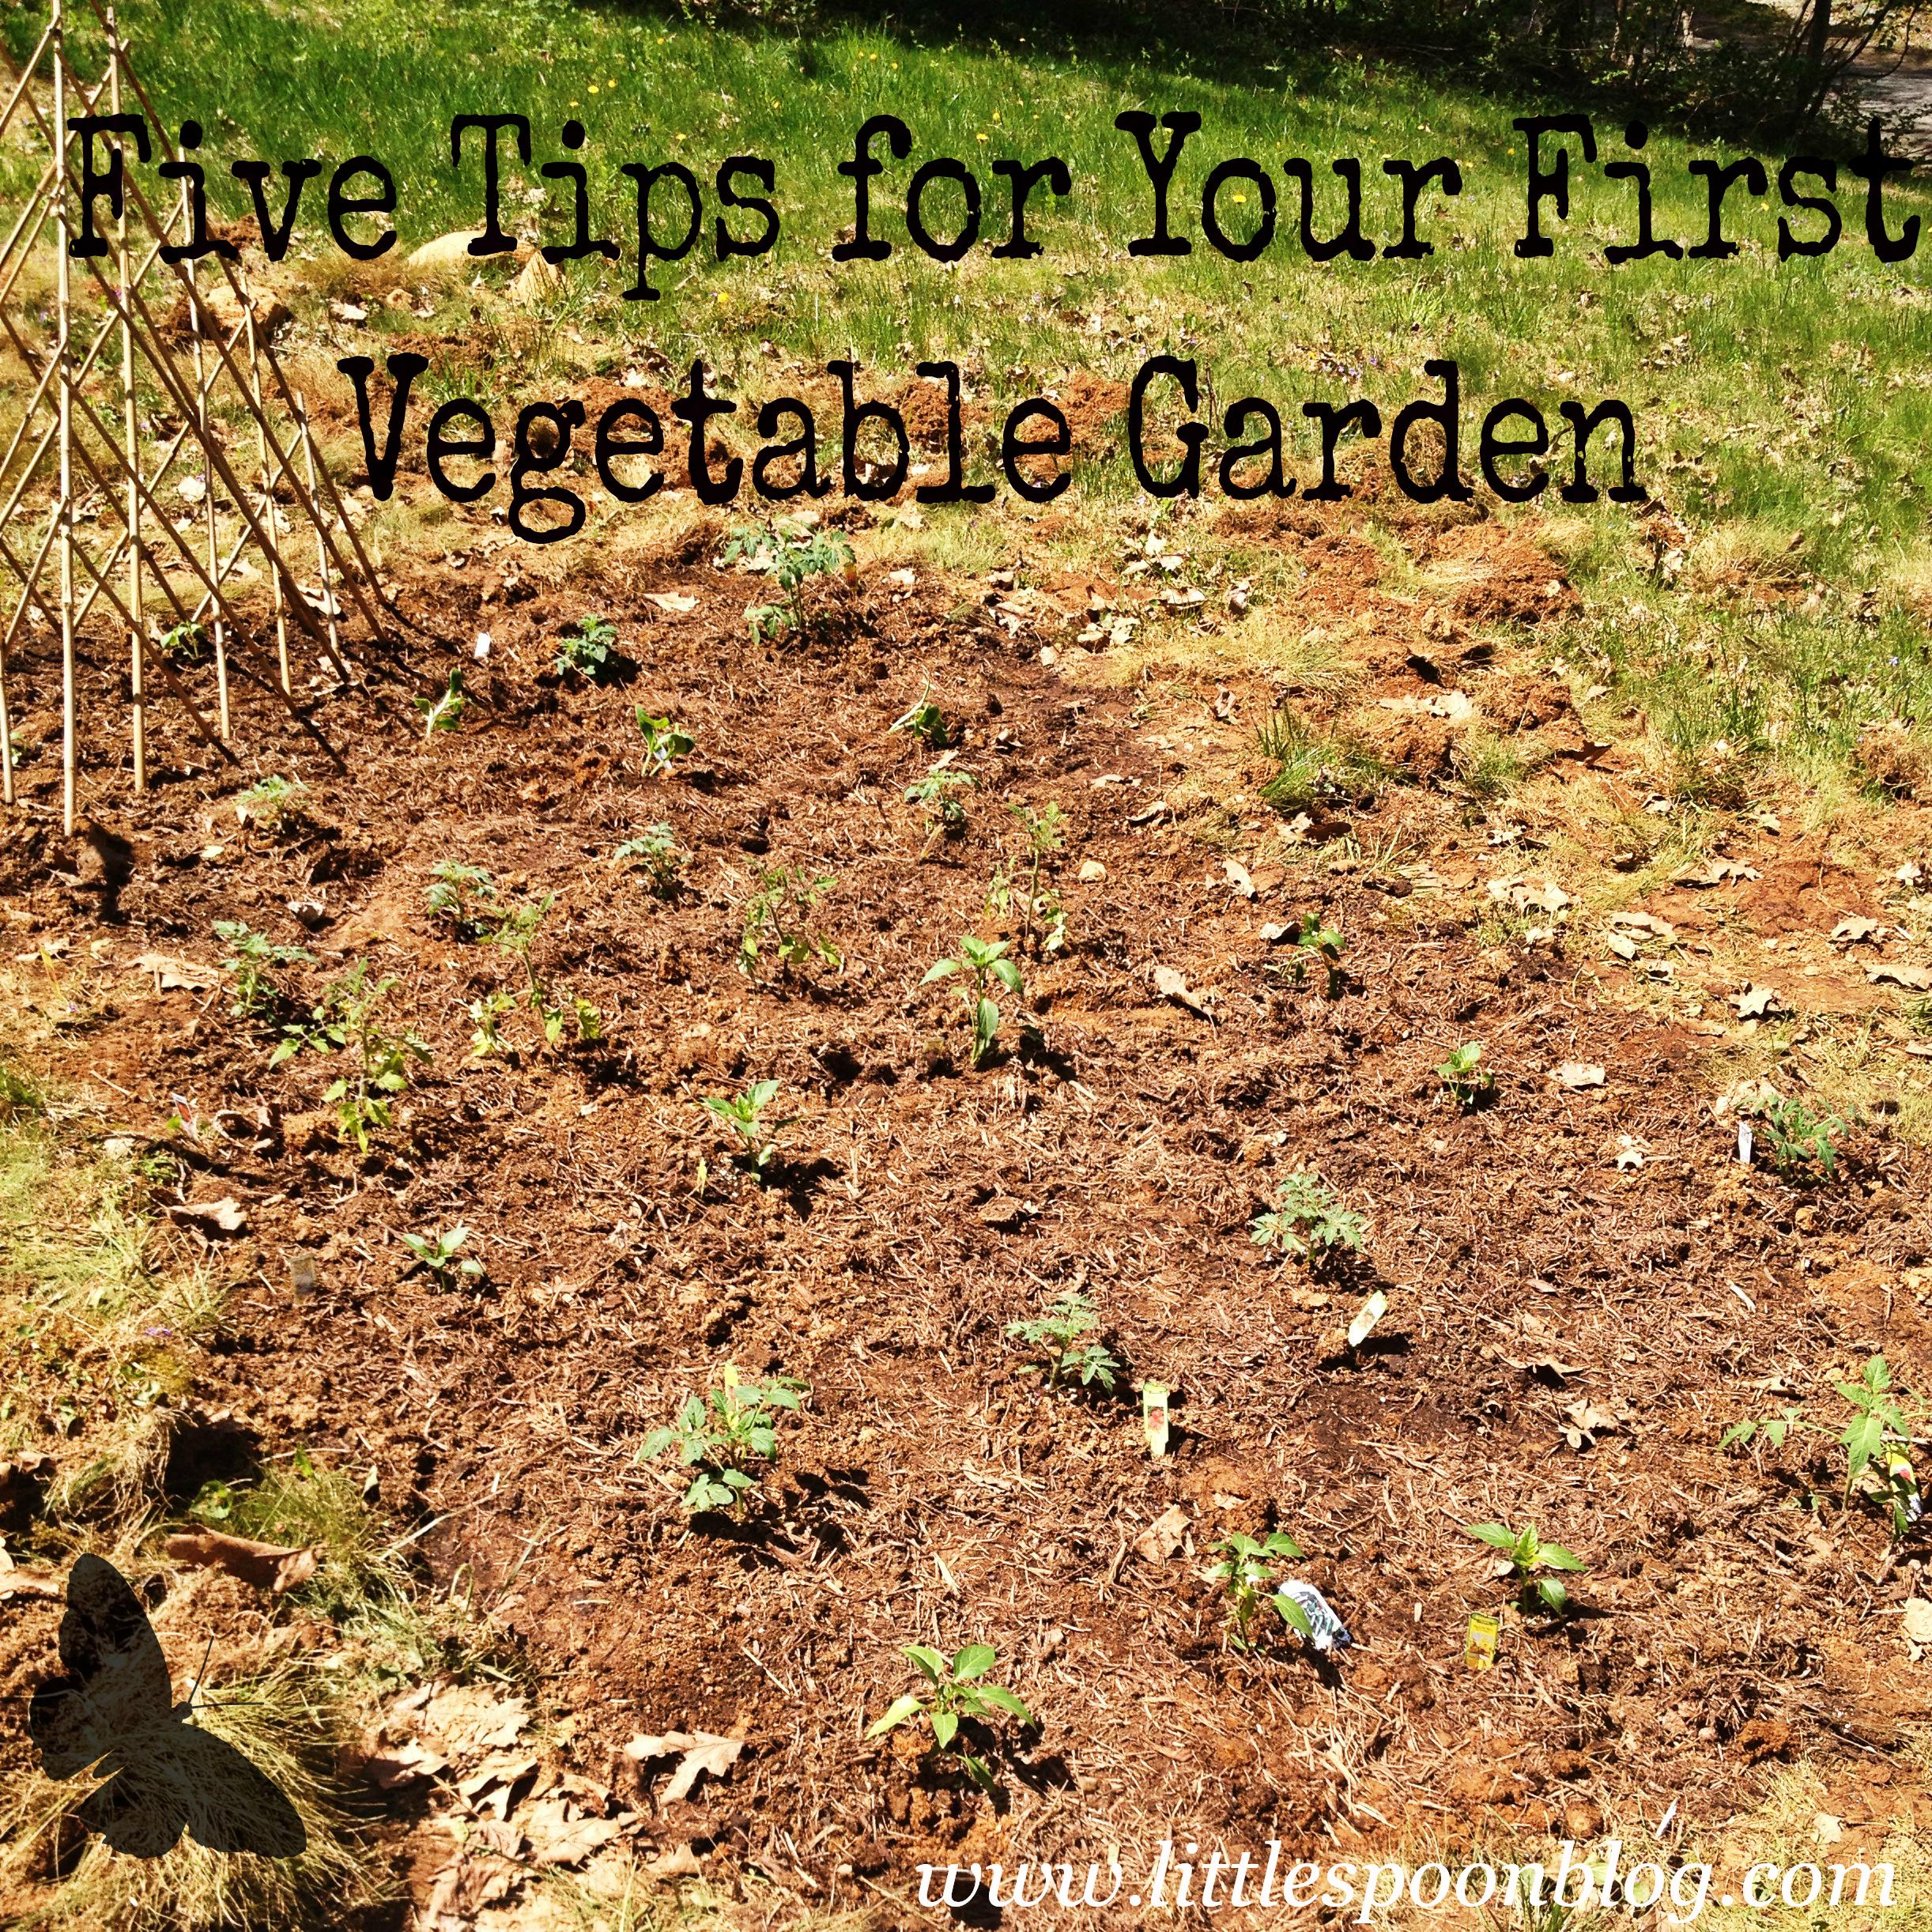 Five Tips For Starting a Vegetable Garden | little spoon blog